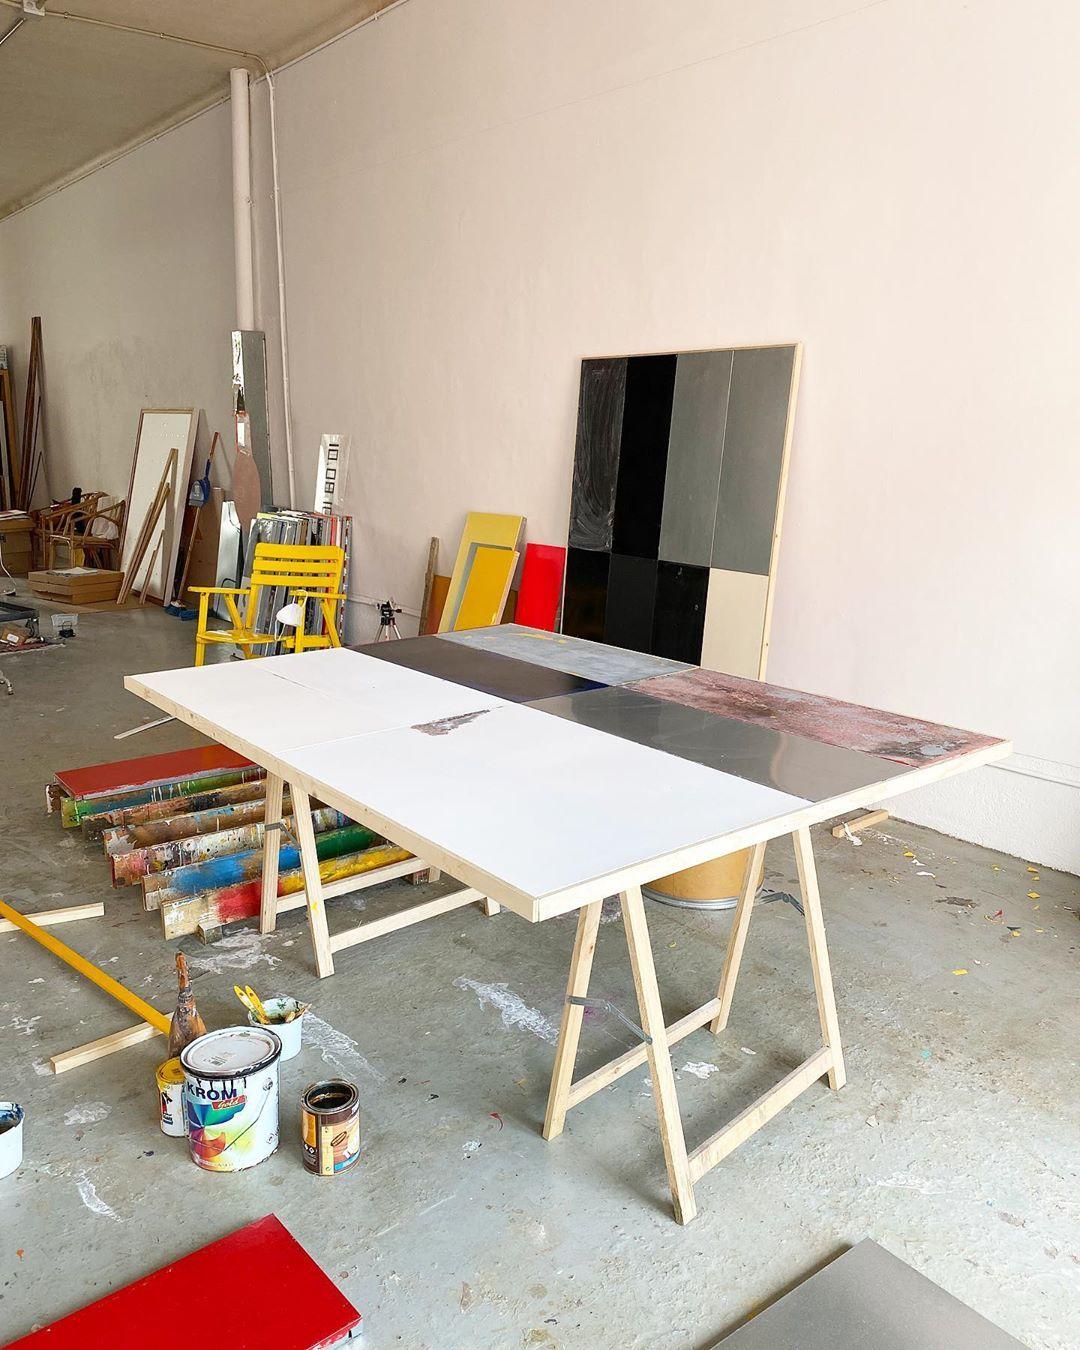 "Bruno Ollé on Instagram: ""#studio #contemporaryartpainting #contemporaryart #studiolife #elmasnou #covid_19 #brunoolle"""